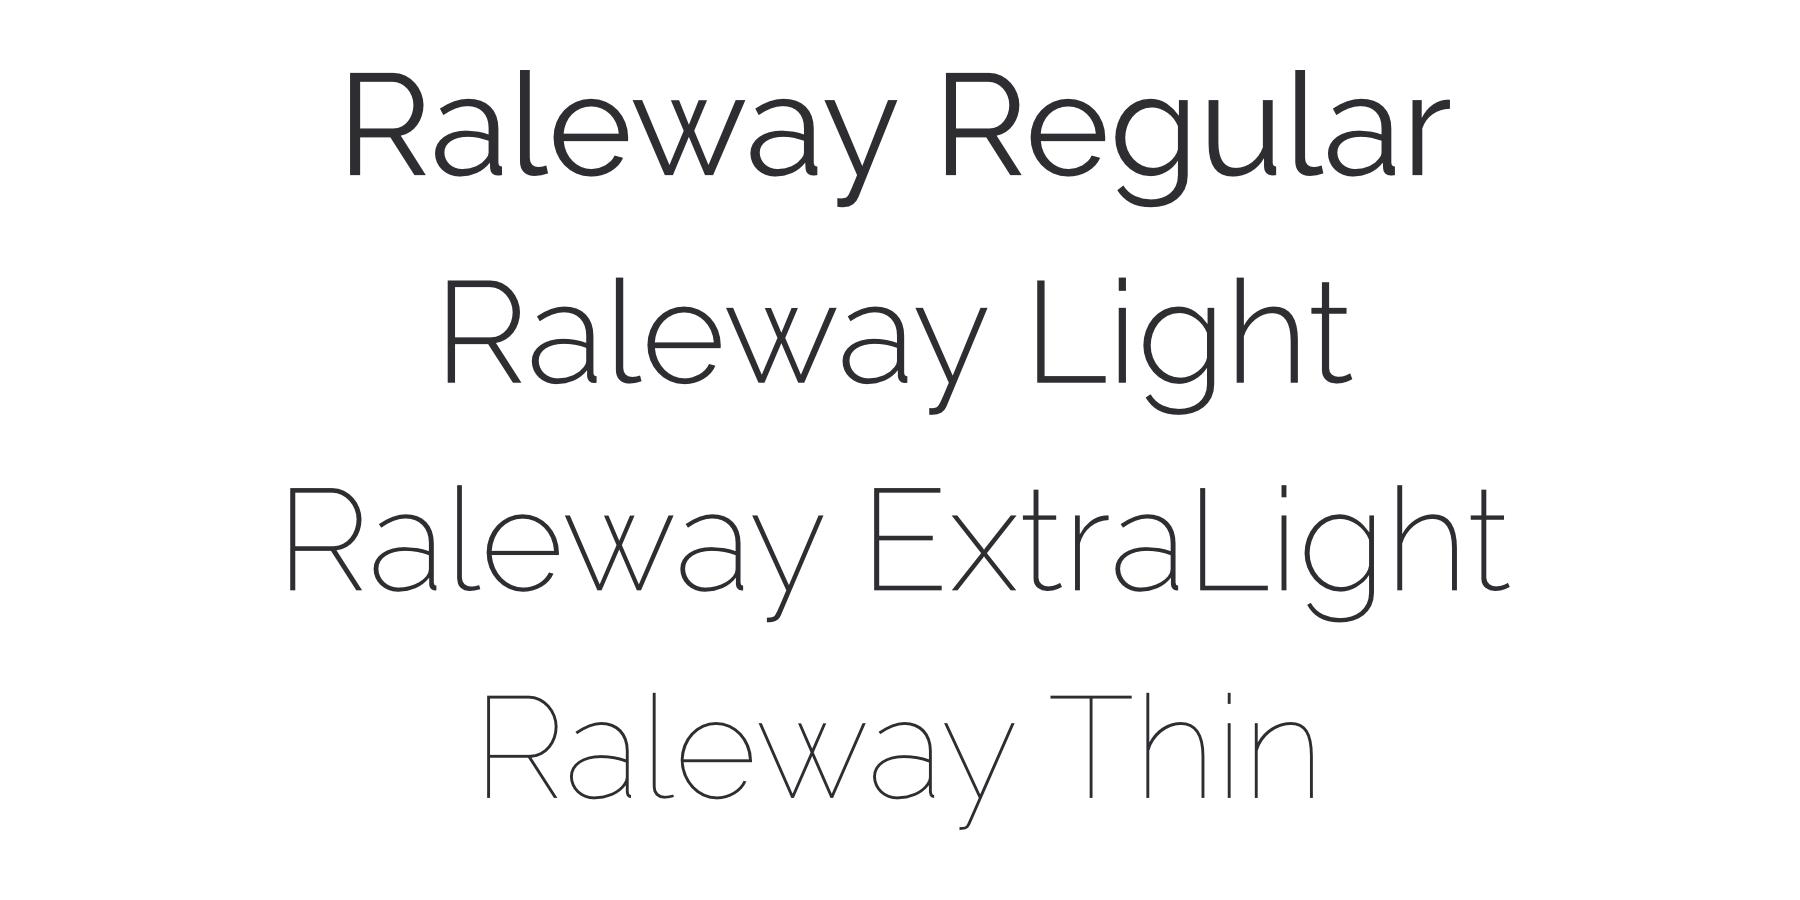 Raleway light font weights